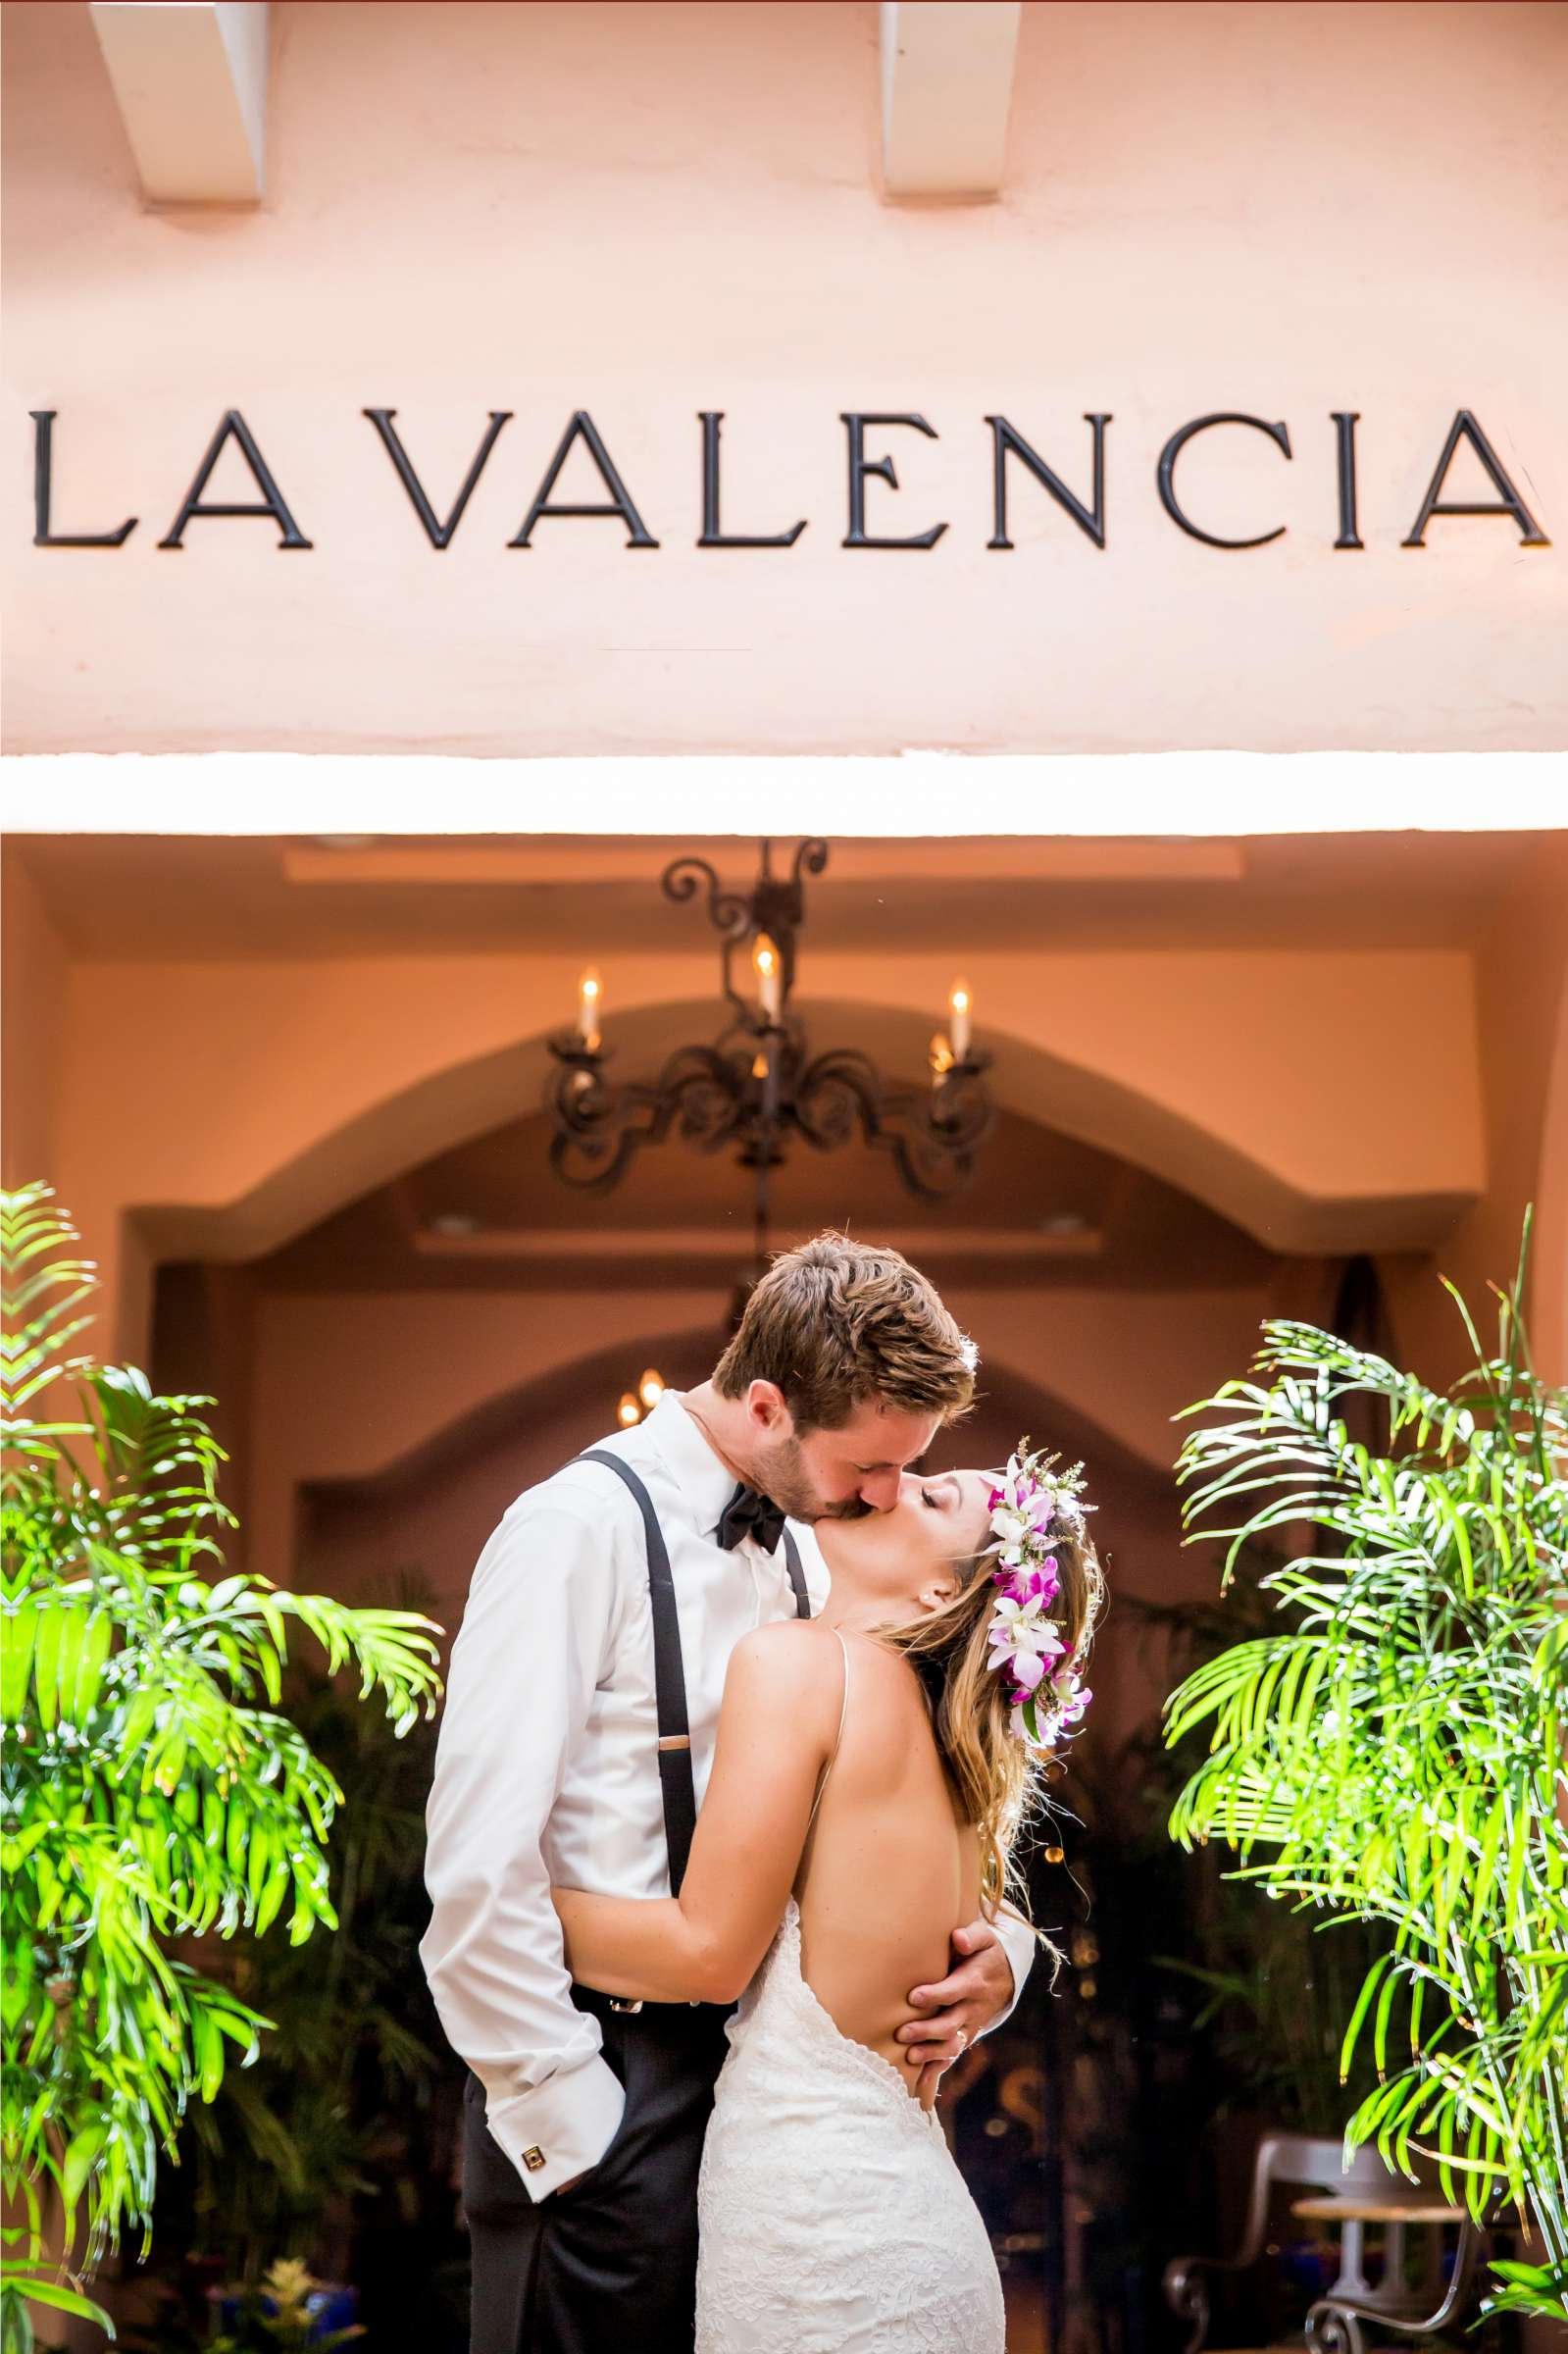 La Valencia | San Diego Photographer - True Photography